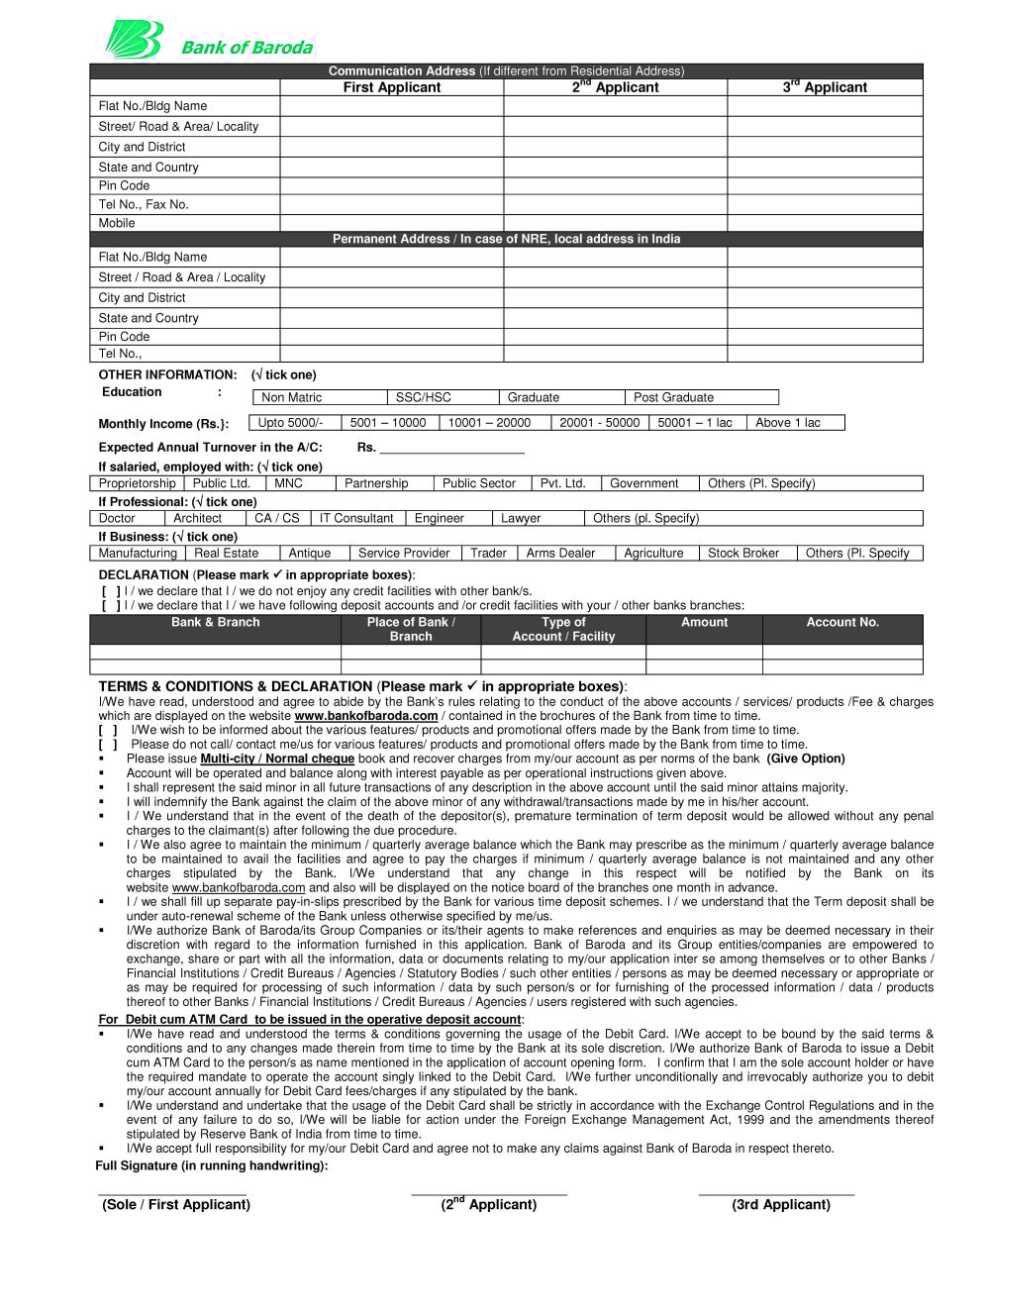 application form bank of baroda baroda account opening form  Bank of baroda, Baroda, Accounting